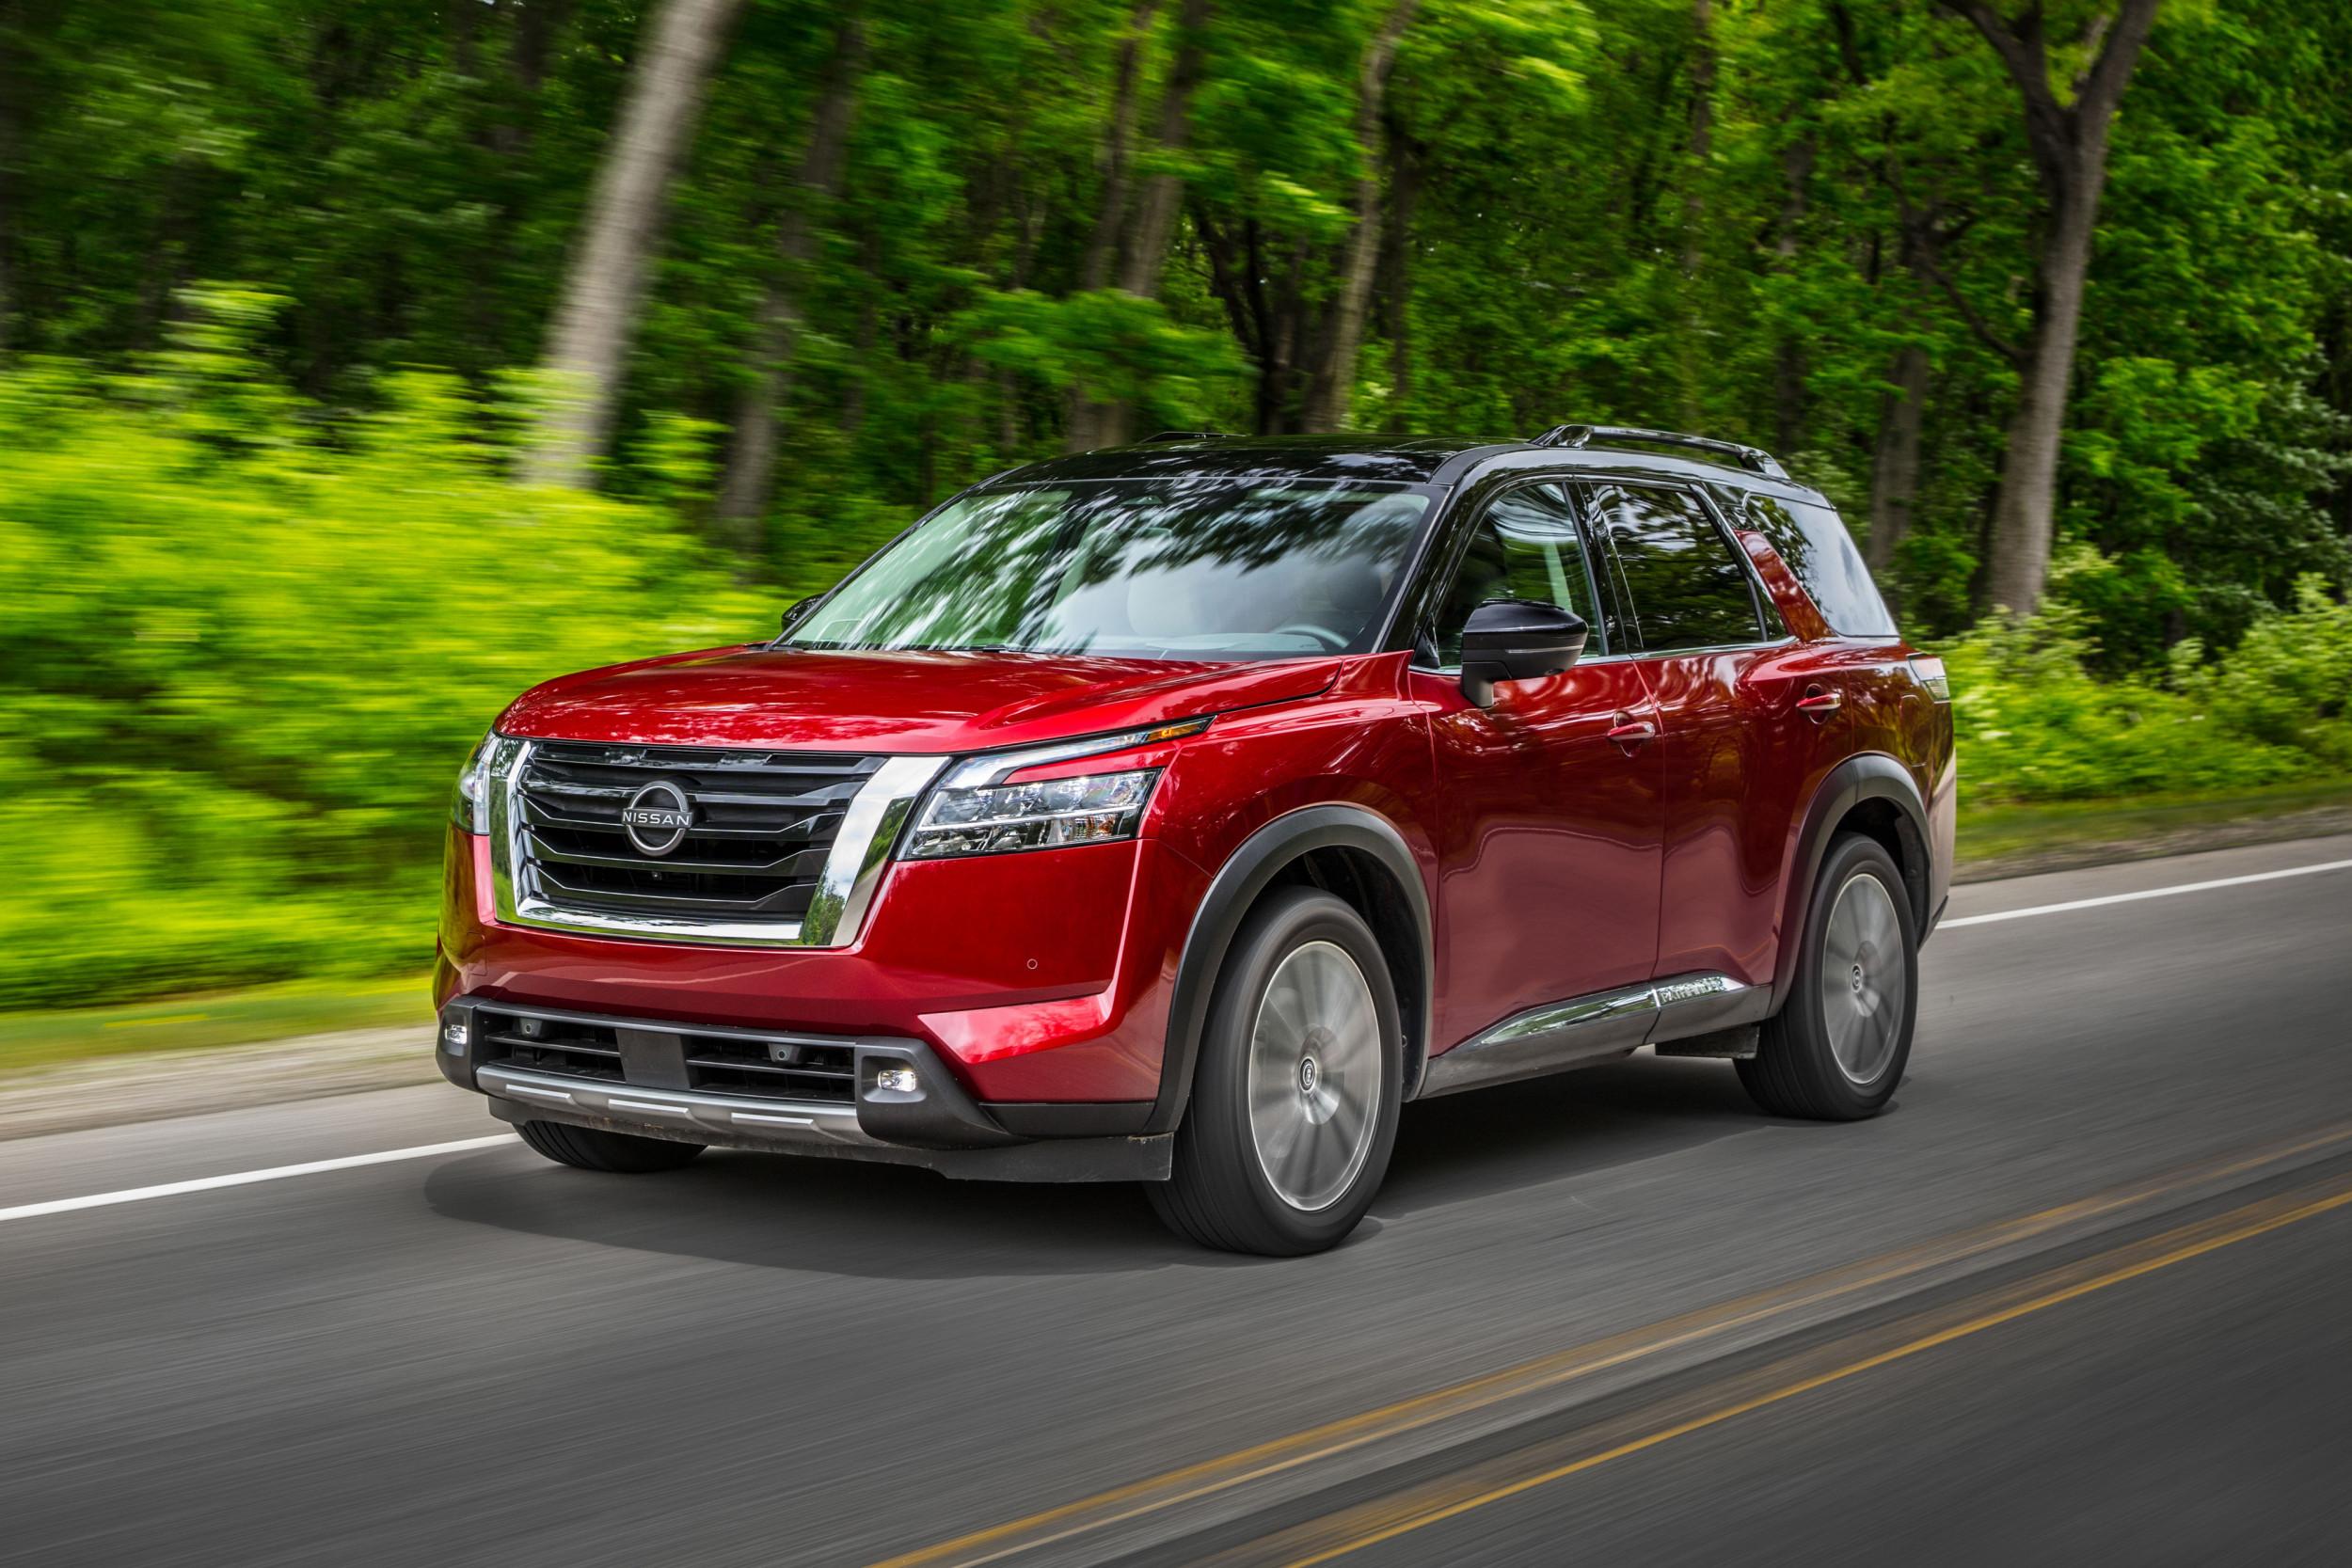 2022 Nissan Pathfinder front face